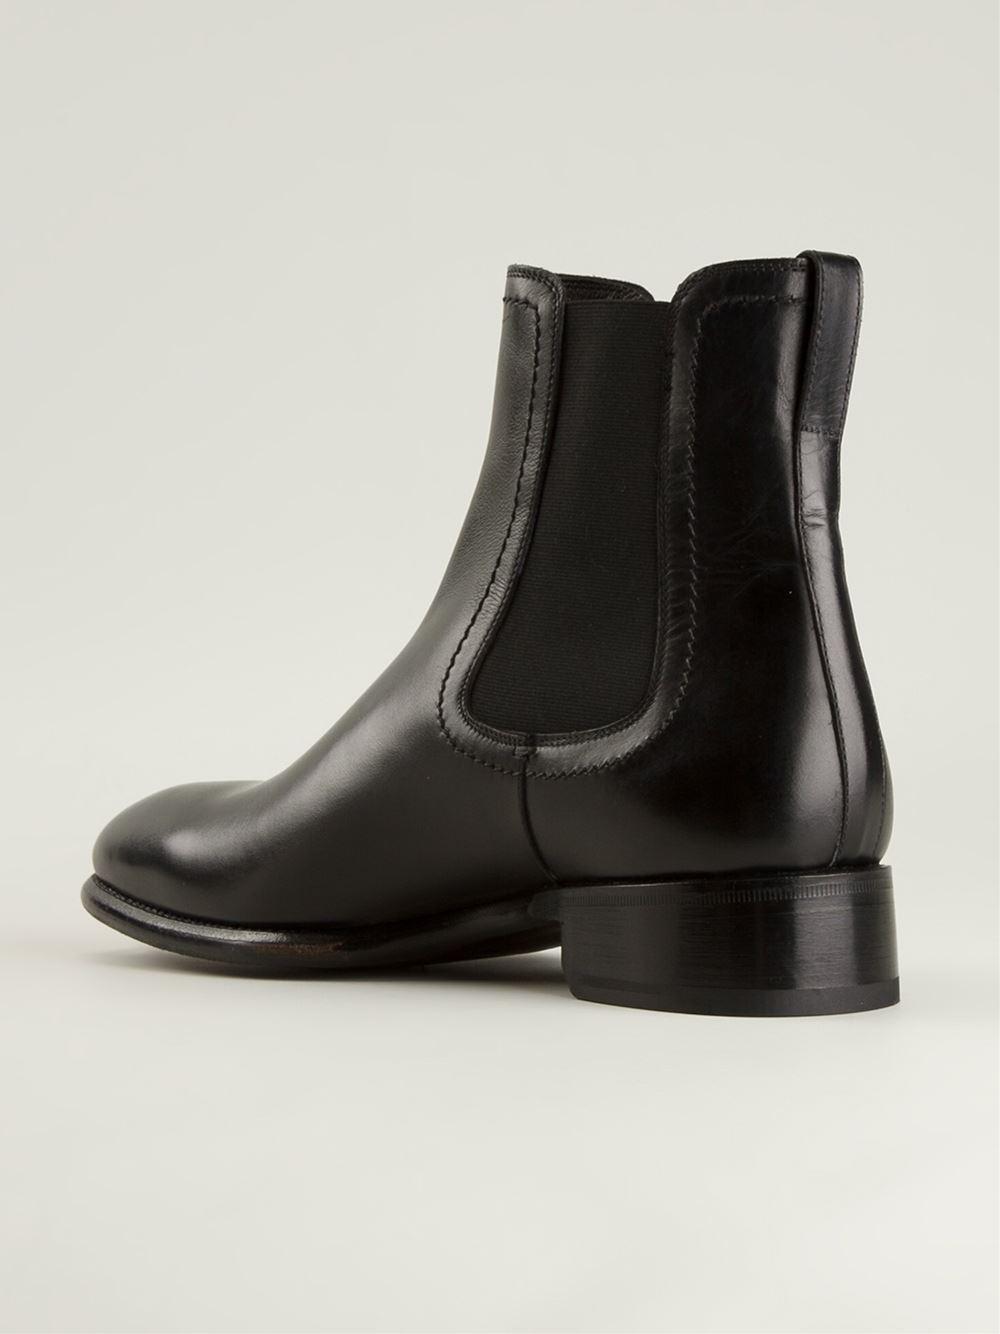 86153052edea Lyst - Max Verre Classic Chelsea Boots in Black for Men